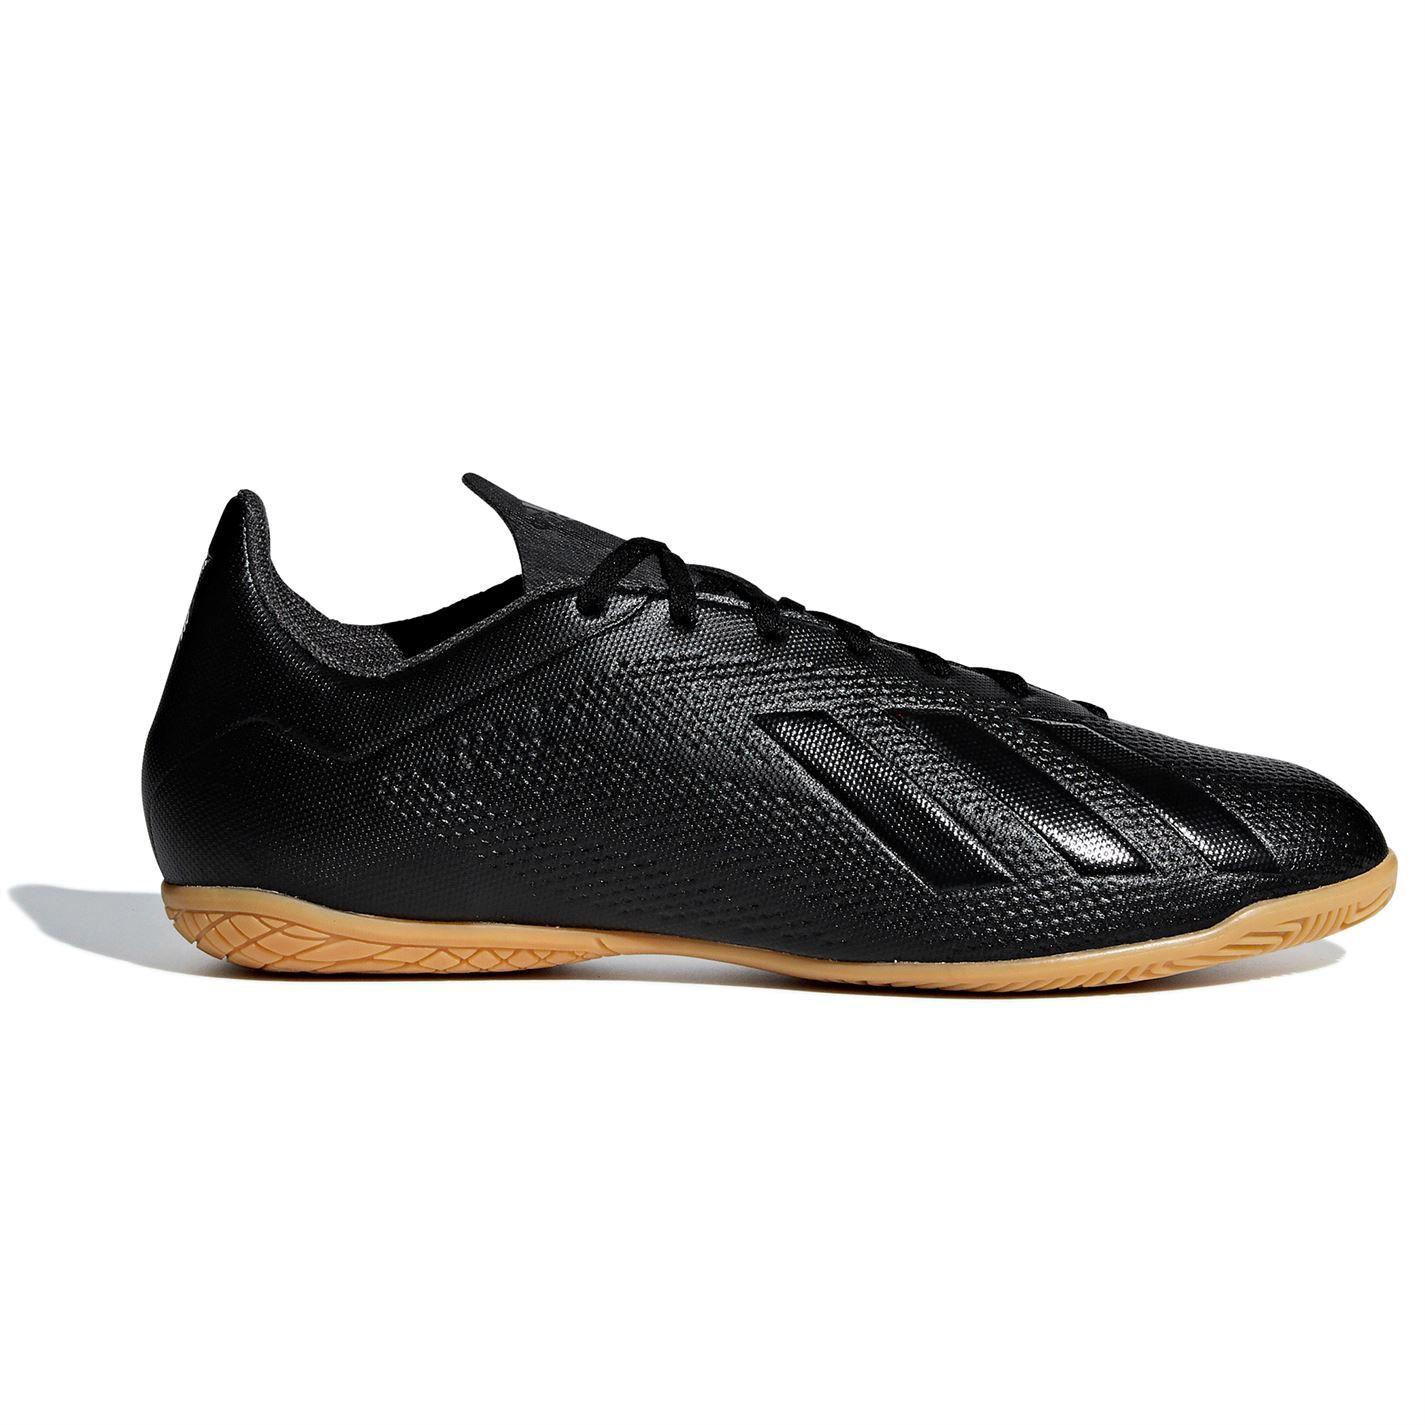 Adidas Shoes For Women Black wallbank lfc.co.uk